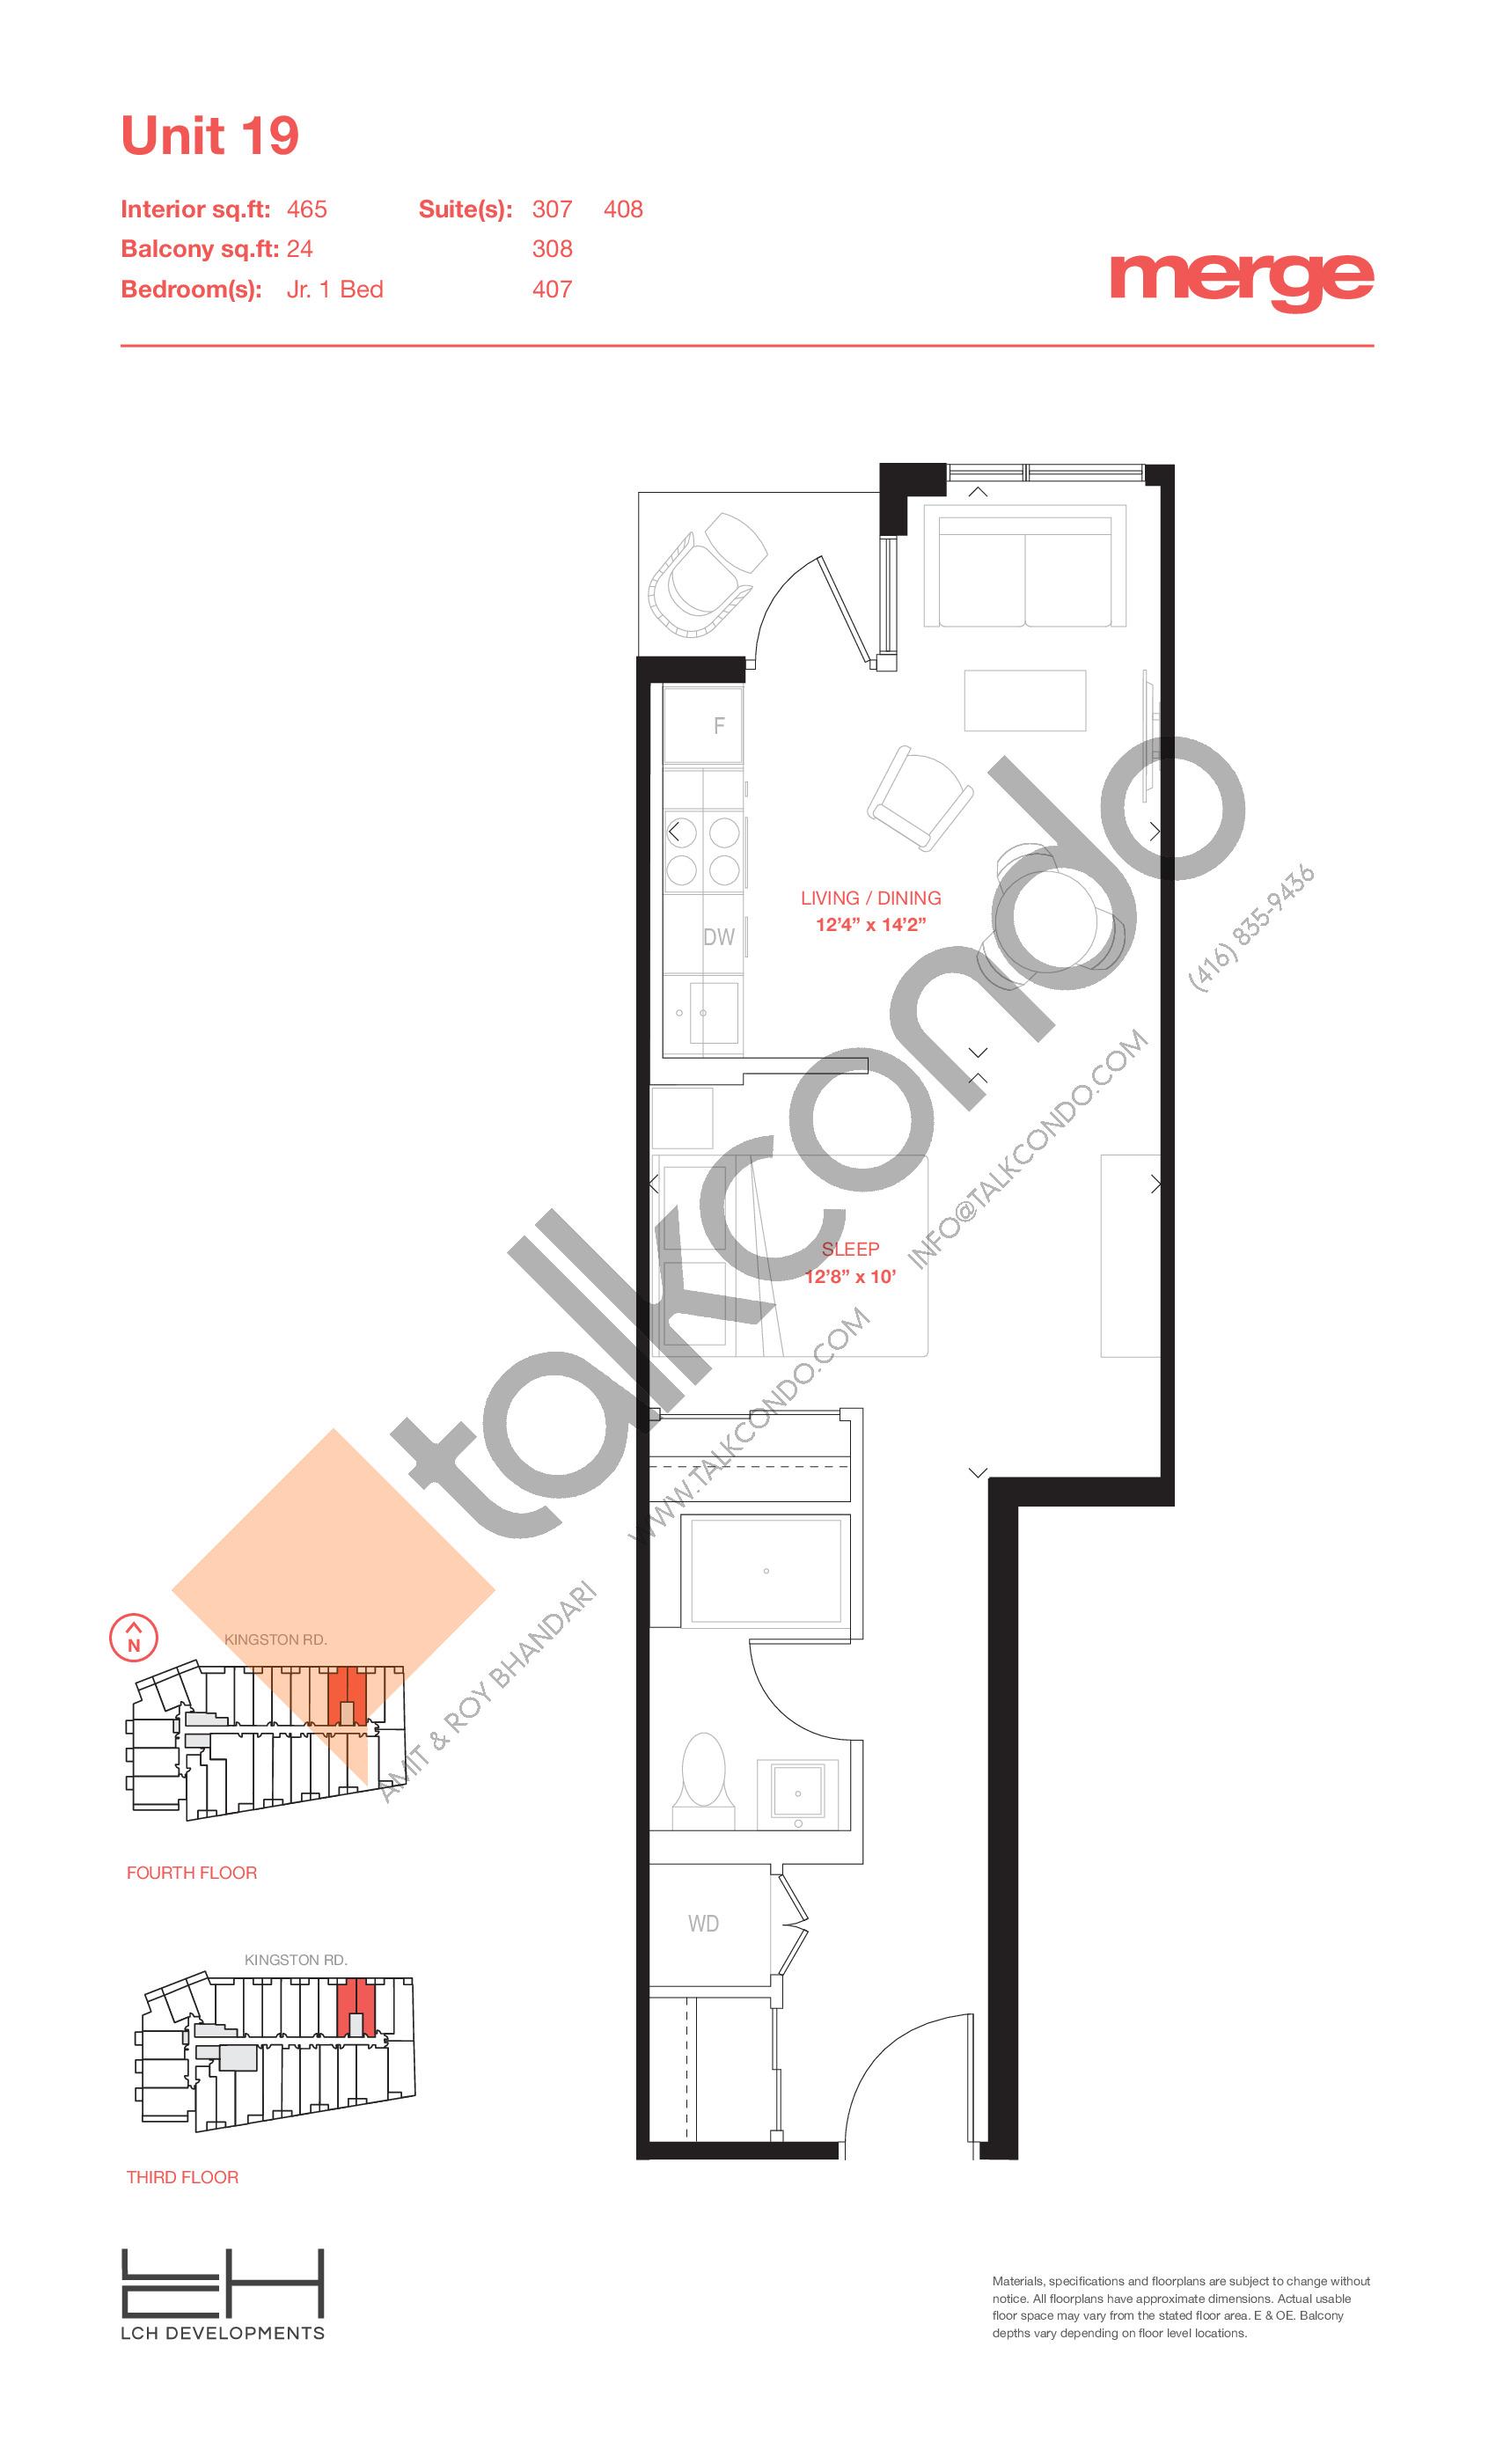 Unit 19 - Tower Floor Plan at Merge Condos - 465 sq.ft